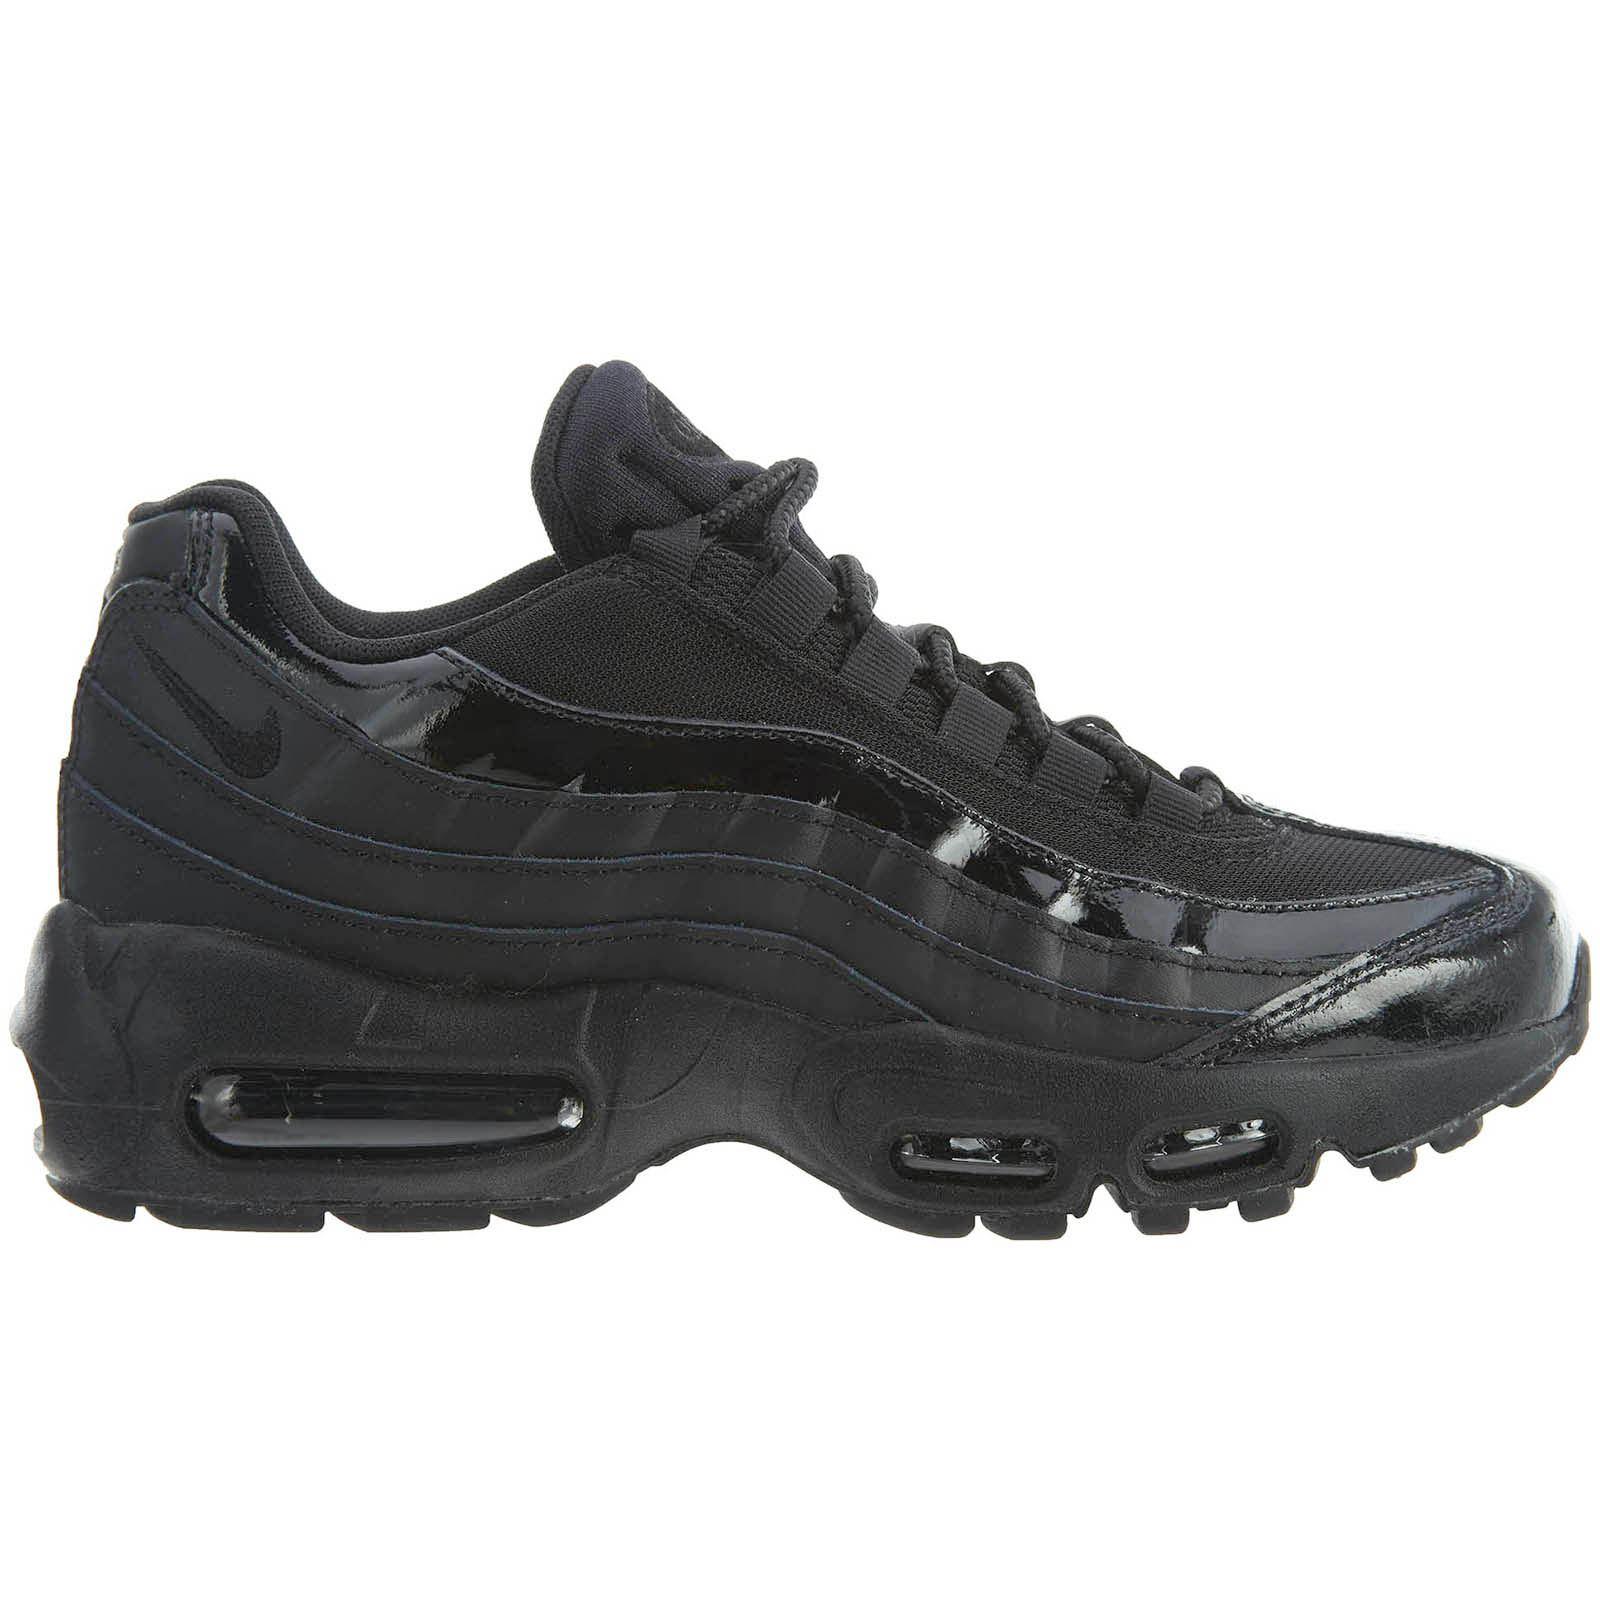 air max 95 leather black